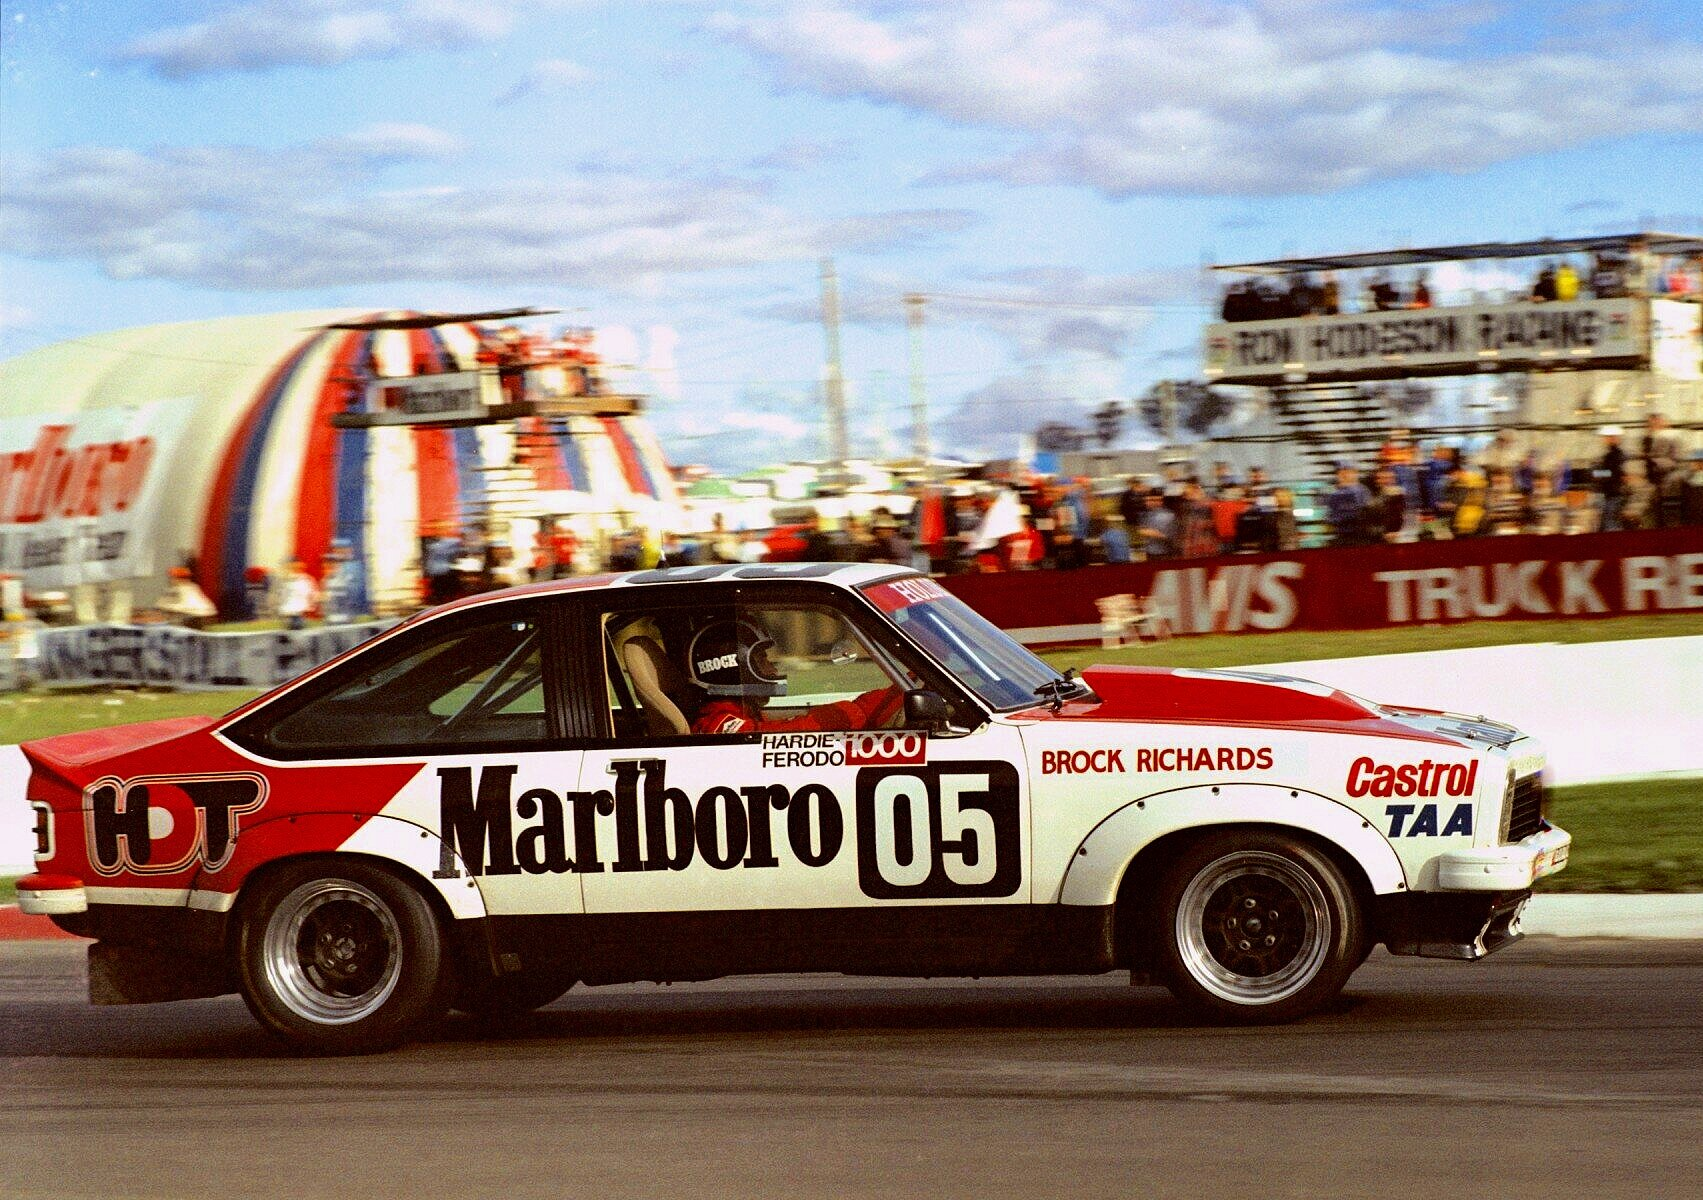 Peter Brock dominates the 1979 Bathurst 1000 in the A9X Torana